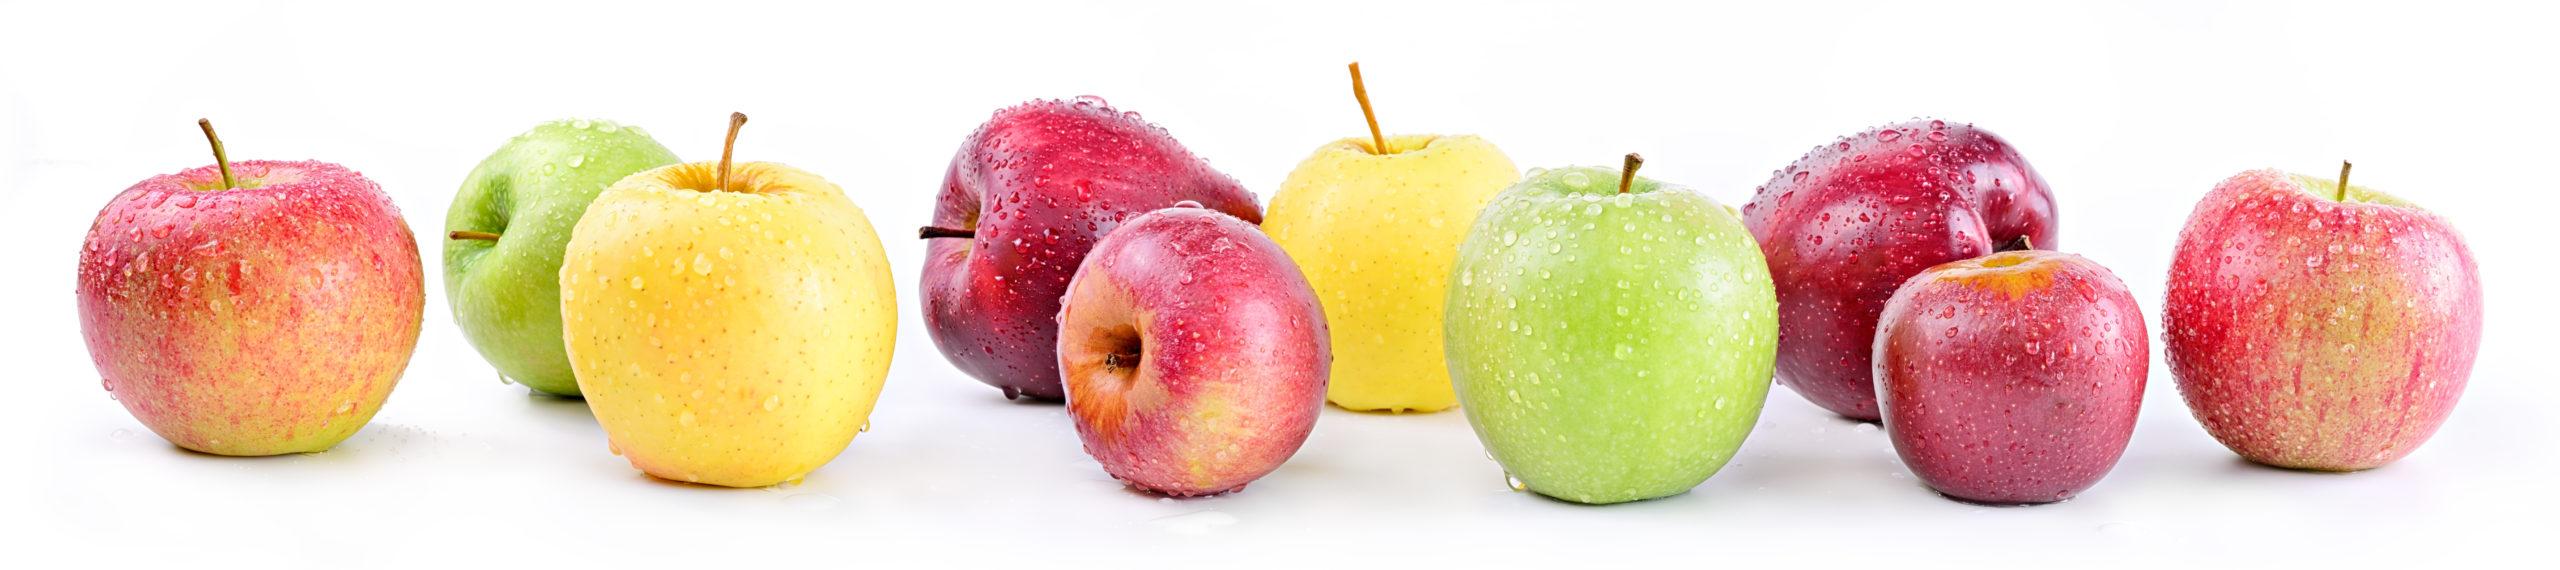 Apple,Varieties:,Annurca,,Stark,Delicious,,Fuji,,Granny,Smith,